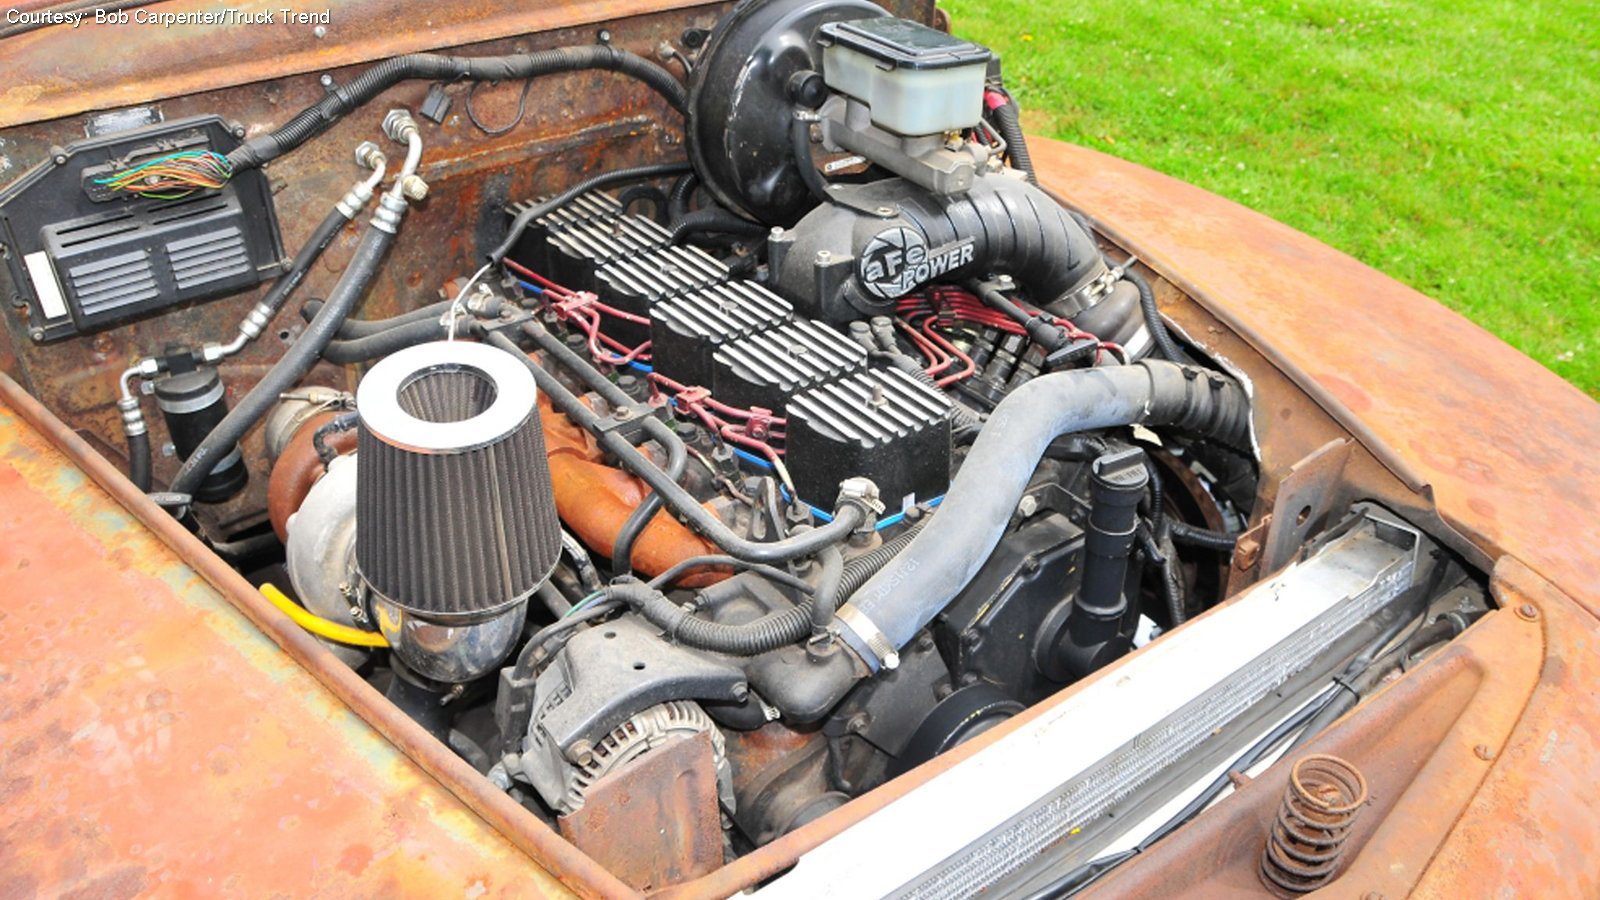 1950 F-1 Farm Rat: Patina or Just Rust?